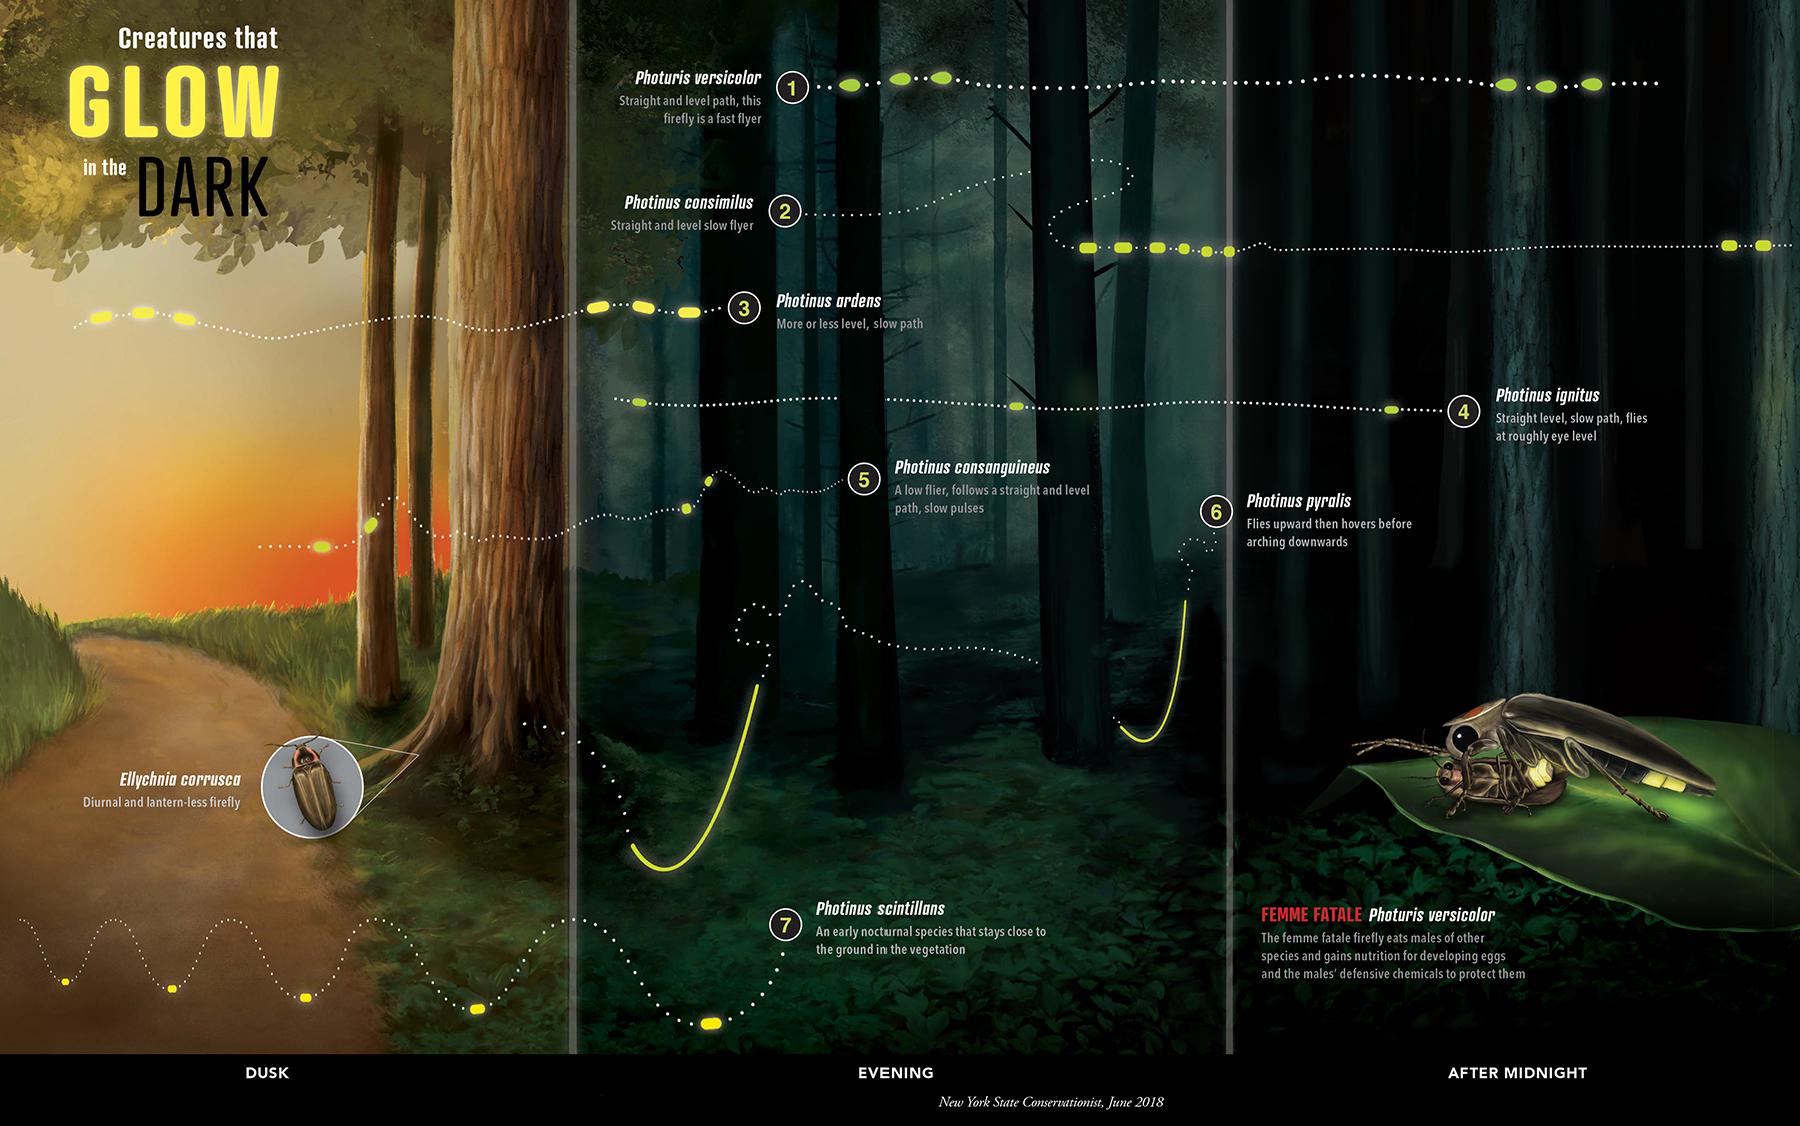 Firefly Flight Pattern Infographic